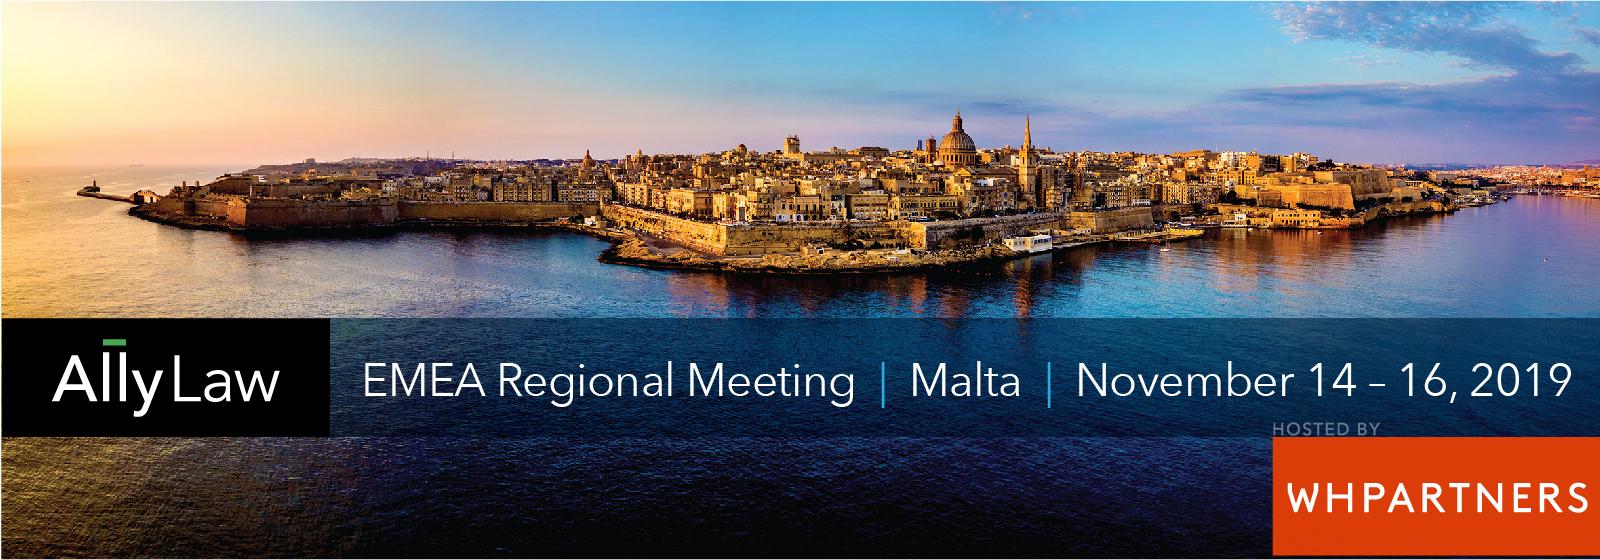 2019 EMEA Regional Meeting